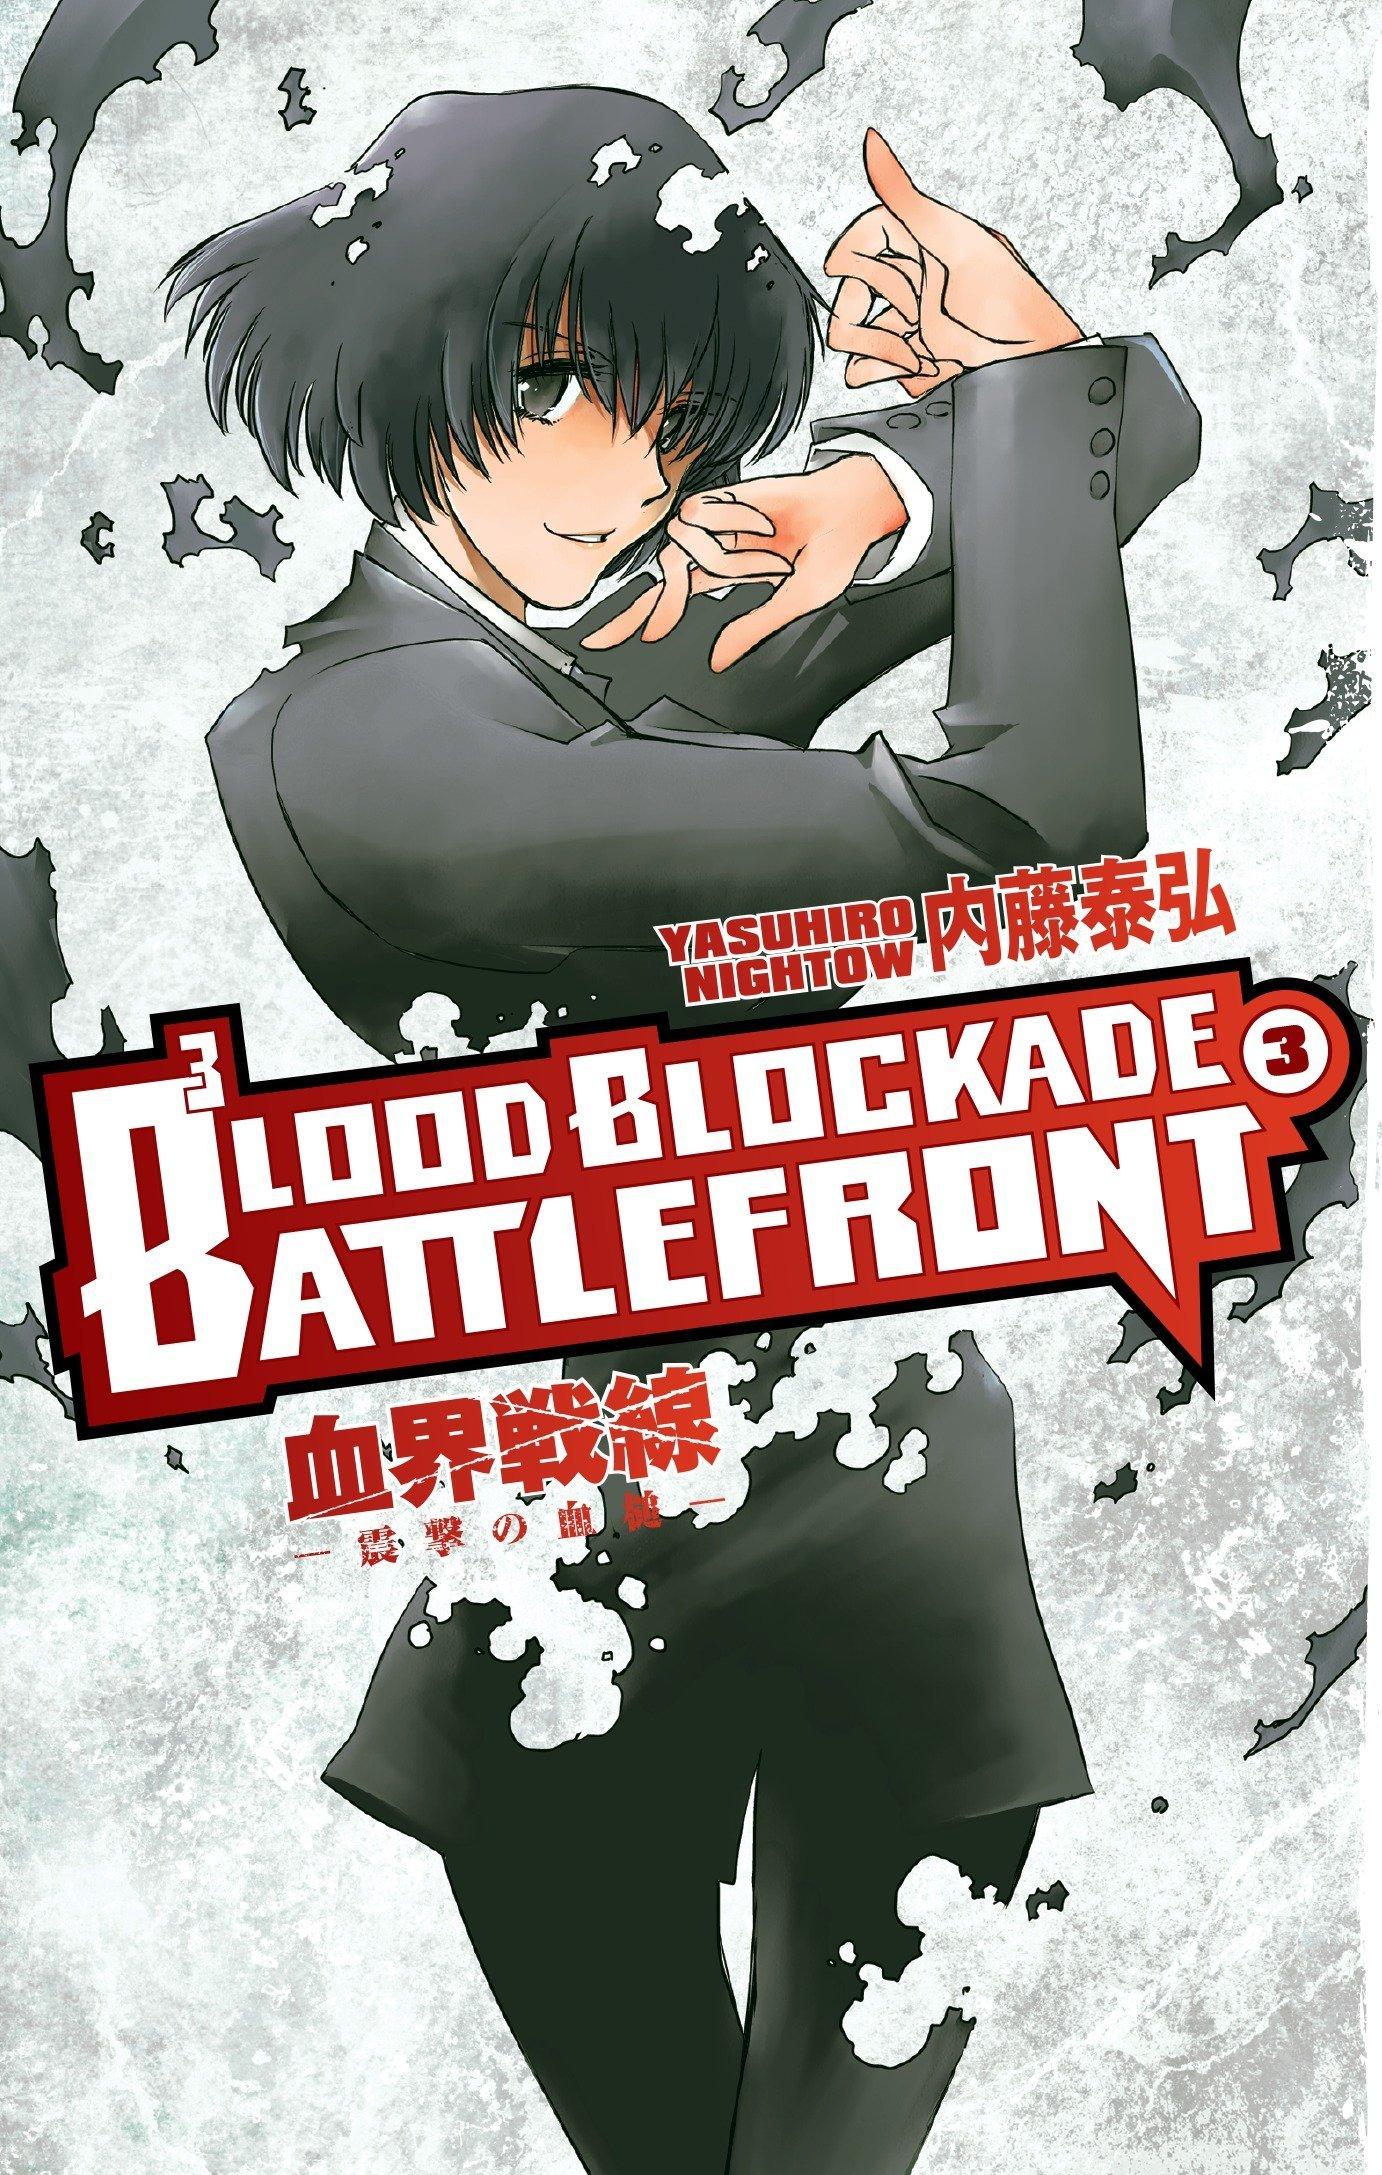 Blood Blockade Battlefront Volume 3 pdf